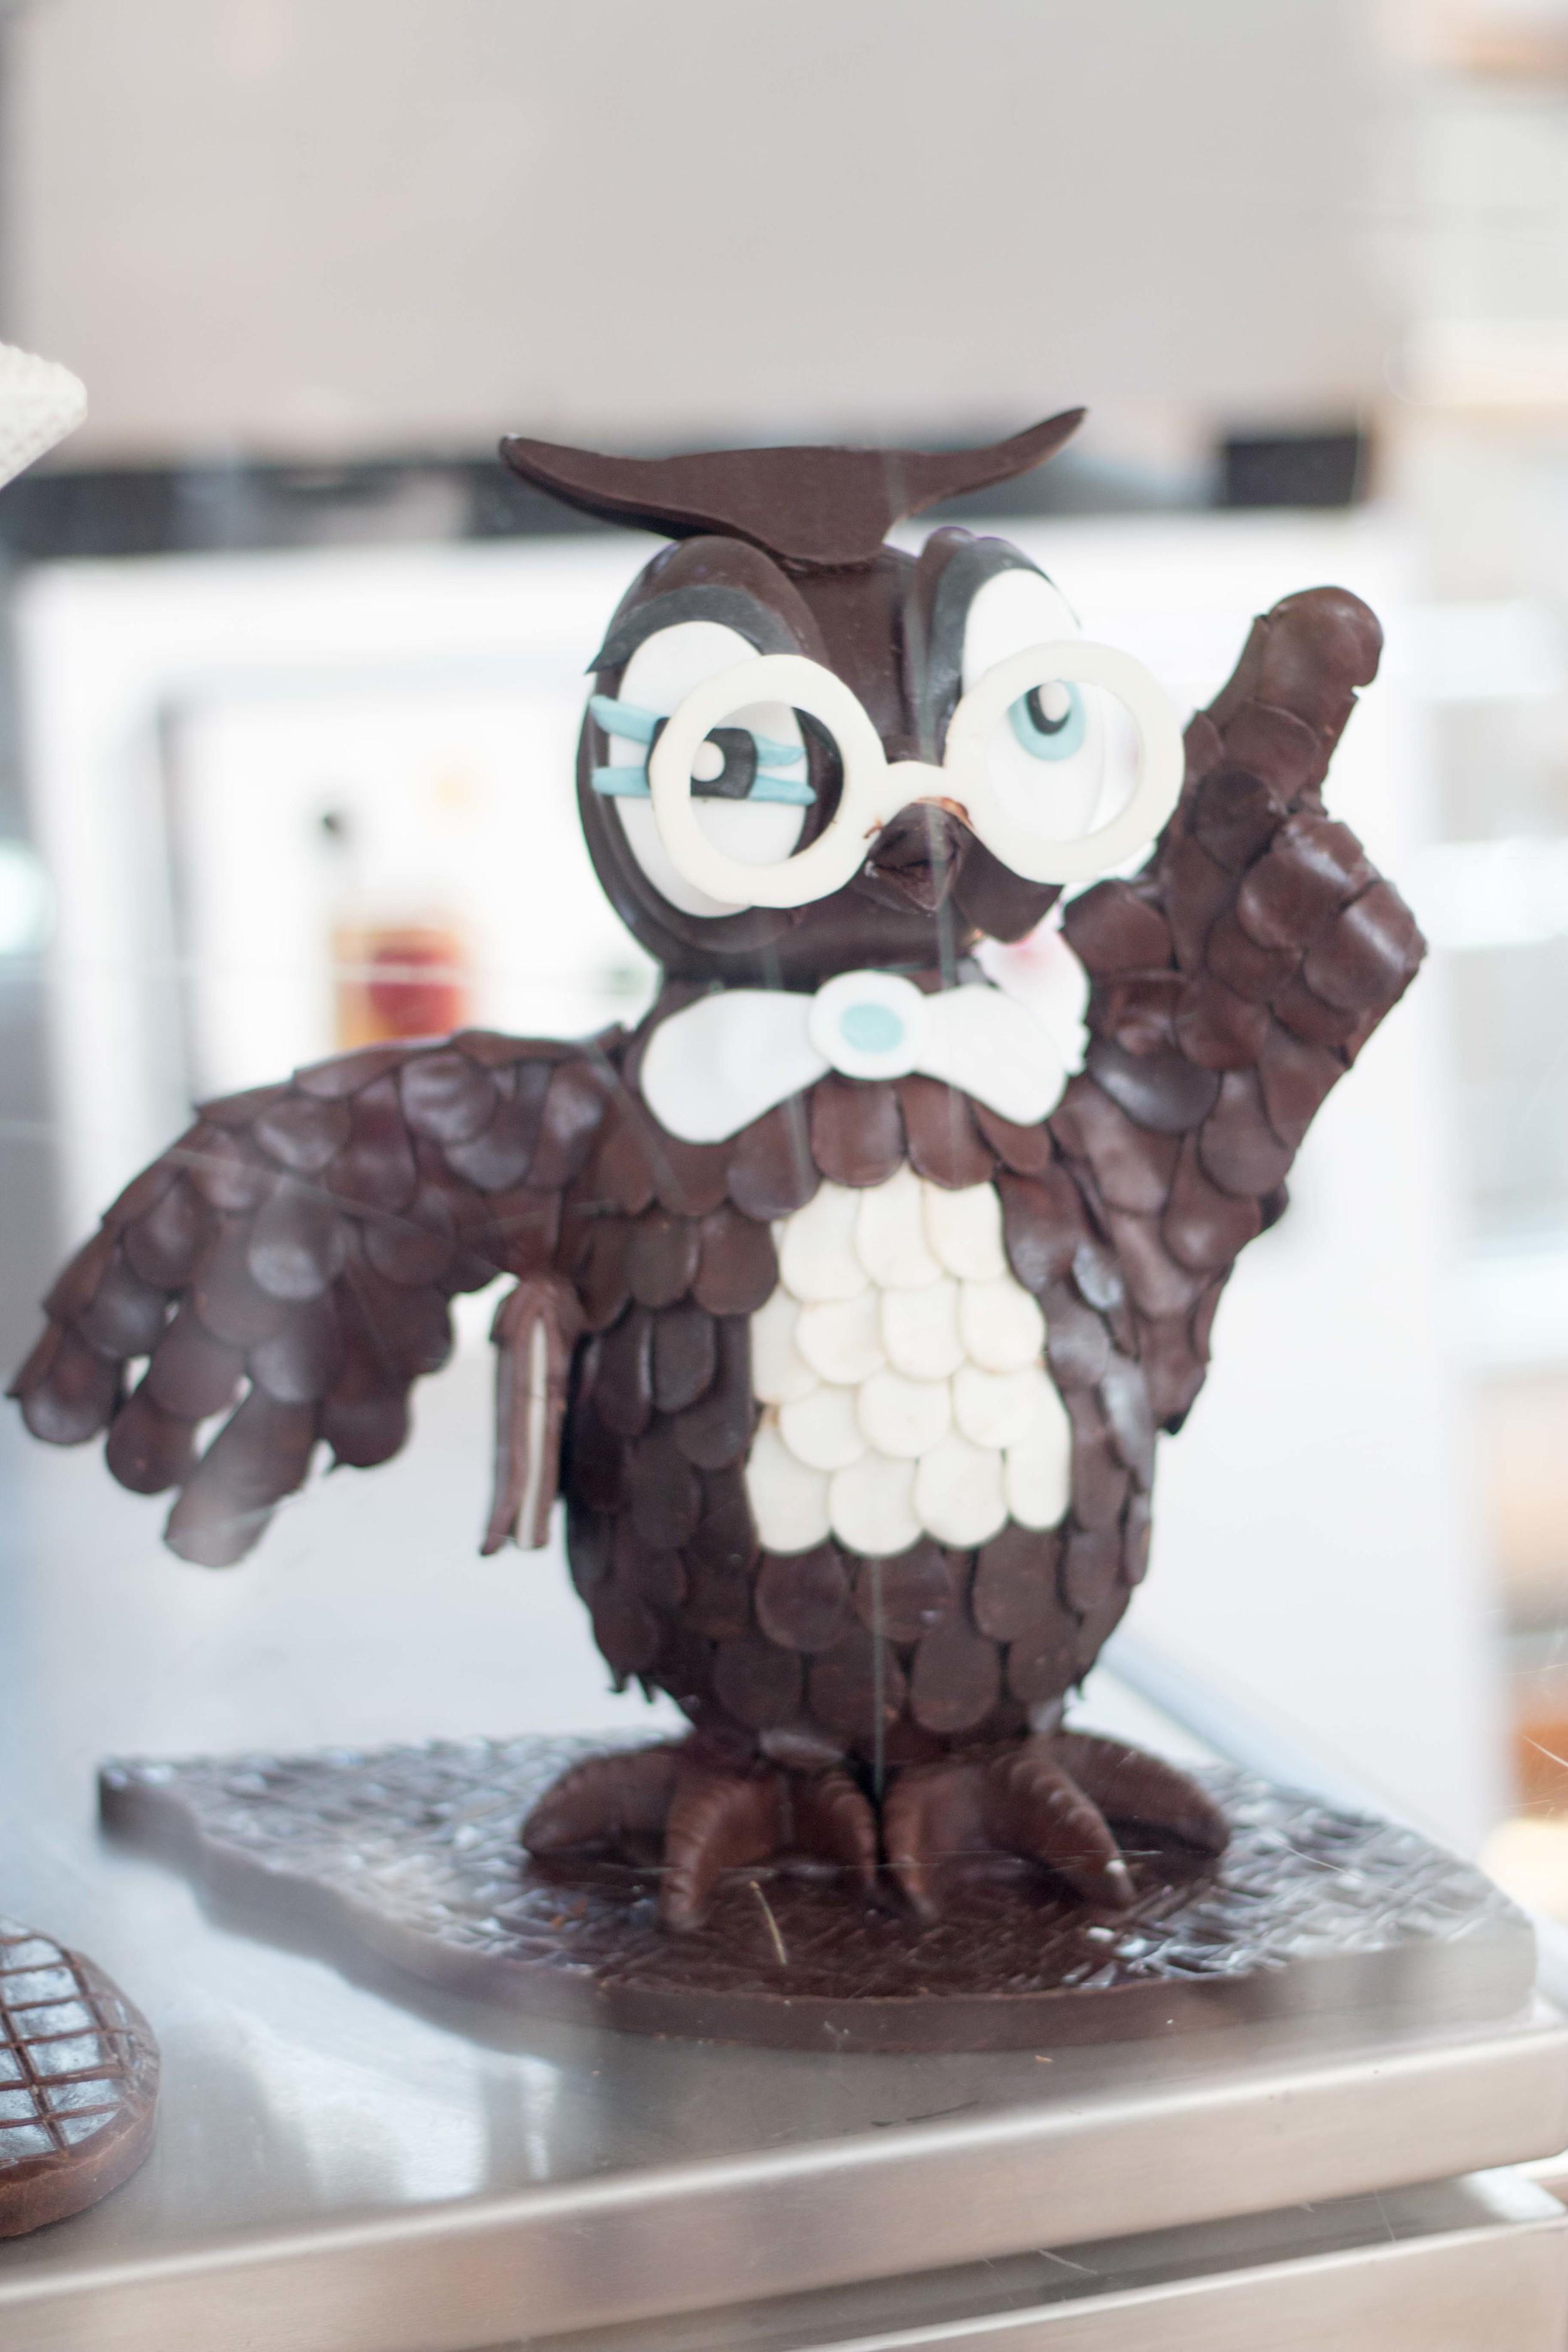 I wonder how I can get a chocolate owl....